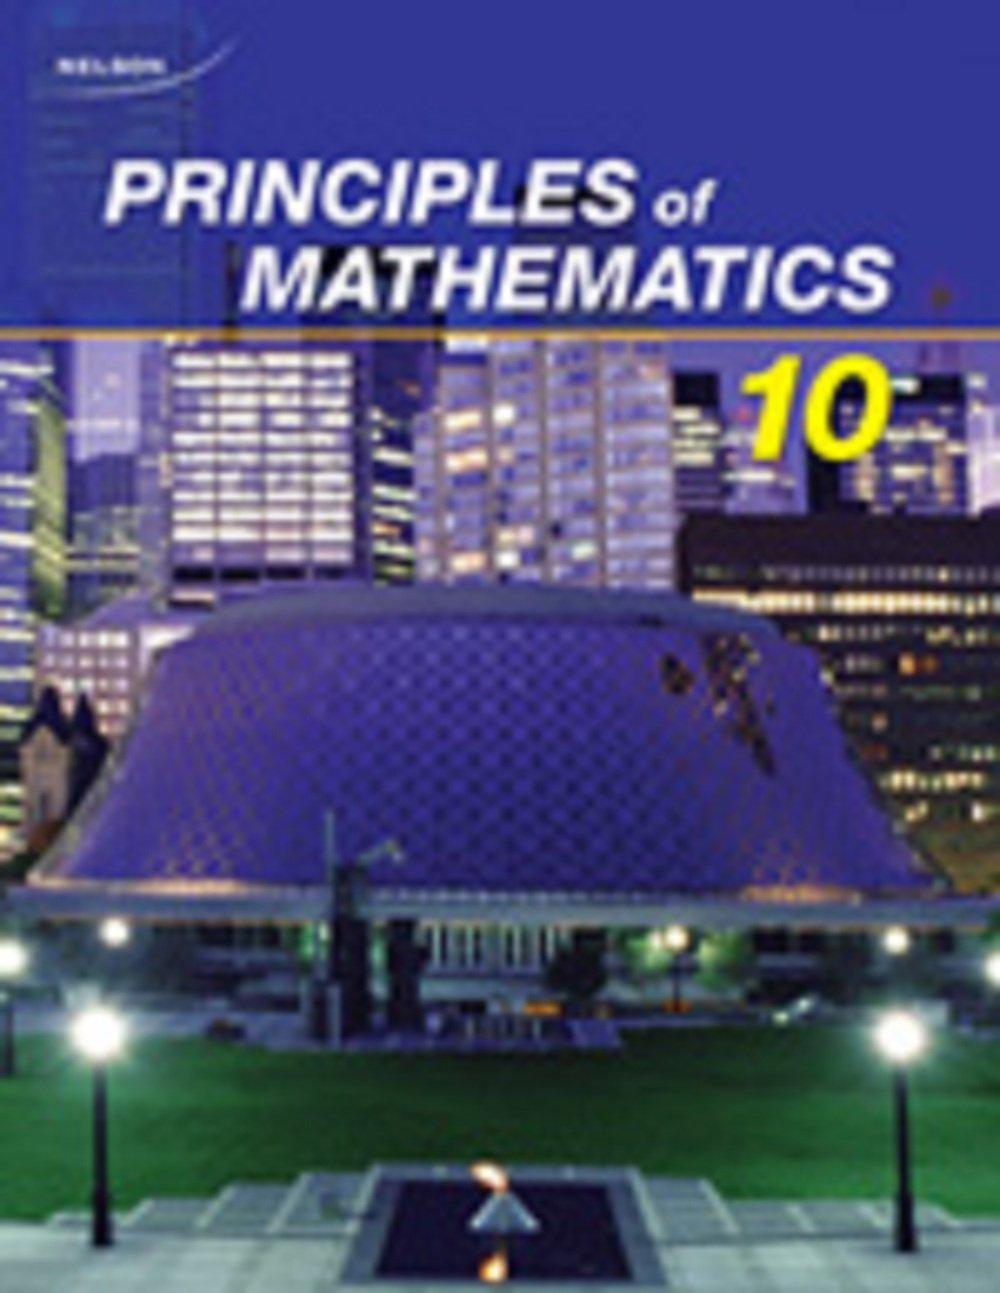 Nelson Principles Of Mathematics 10 Student Text Small Marian Kirkpatrick Chris Bourassa Mary 9780176332020 Amazon Com Books [ 1293 x 1000 Pixel ]